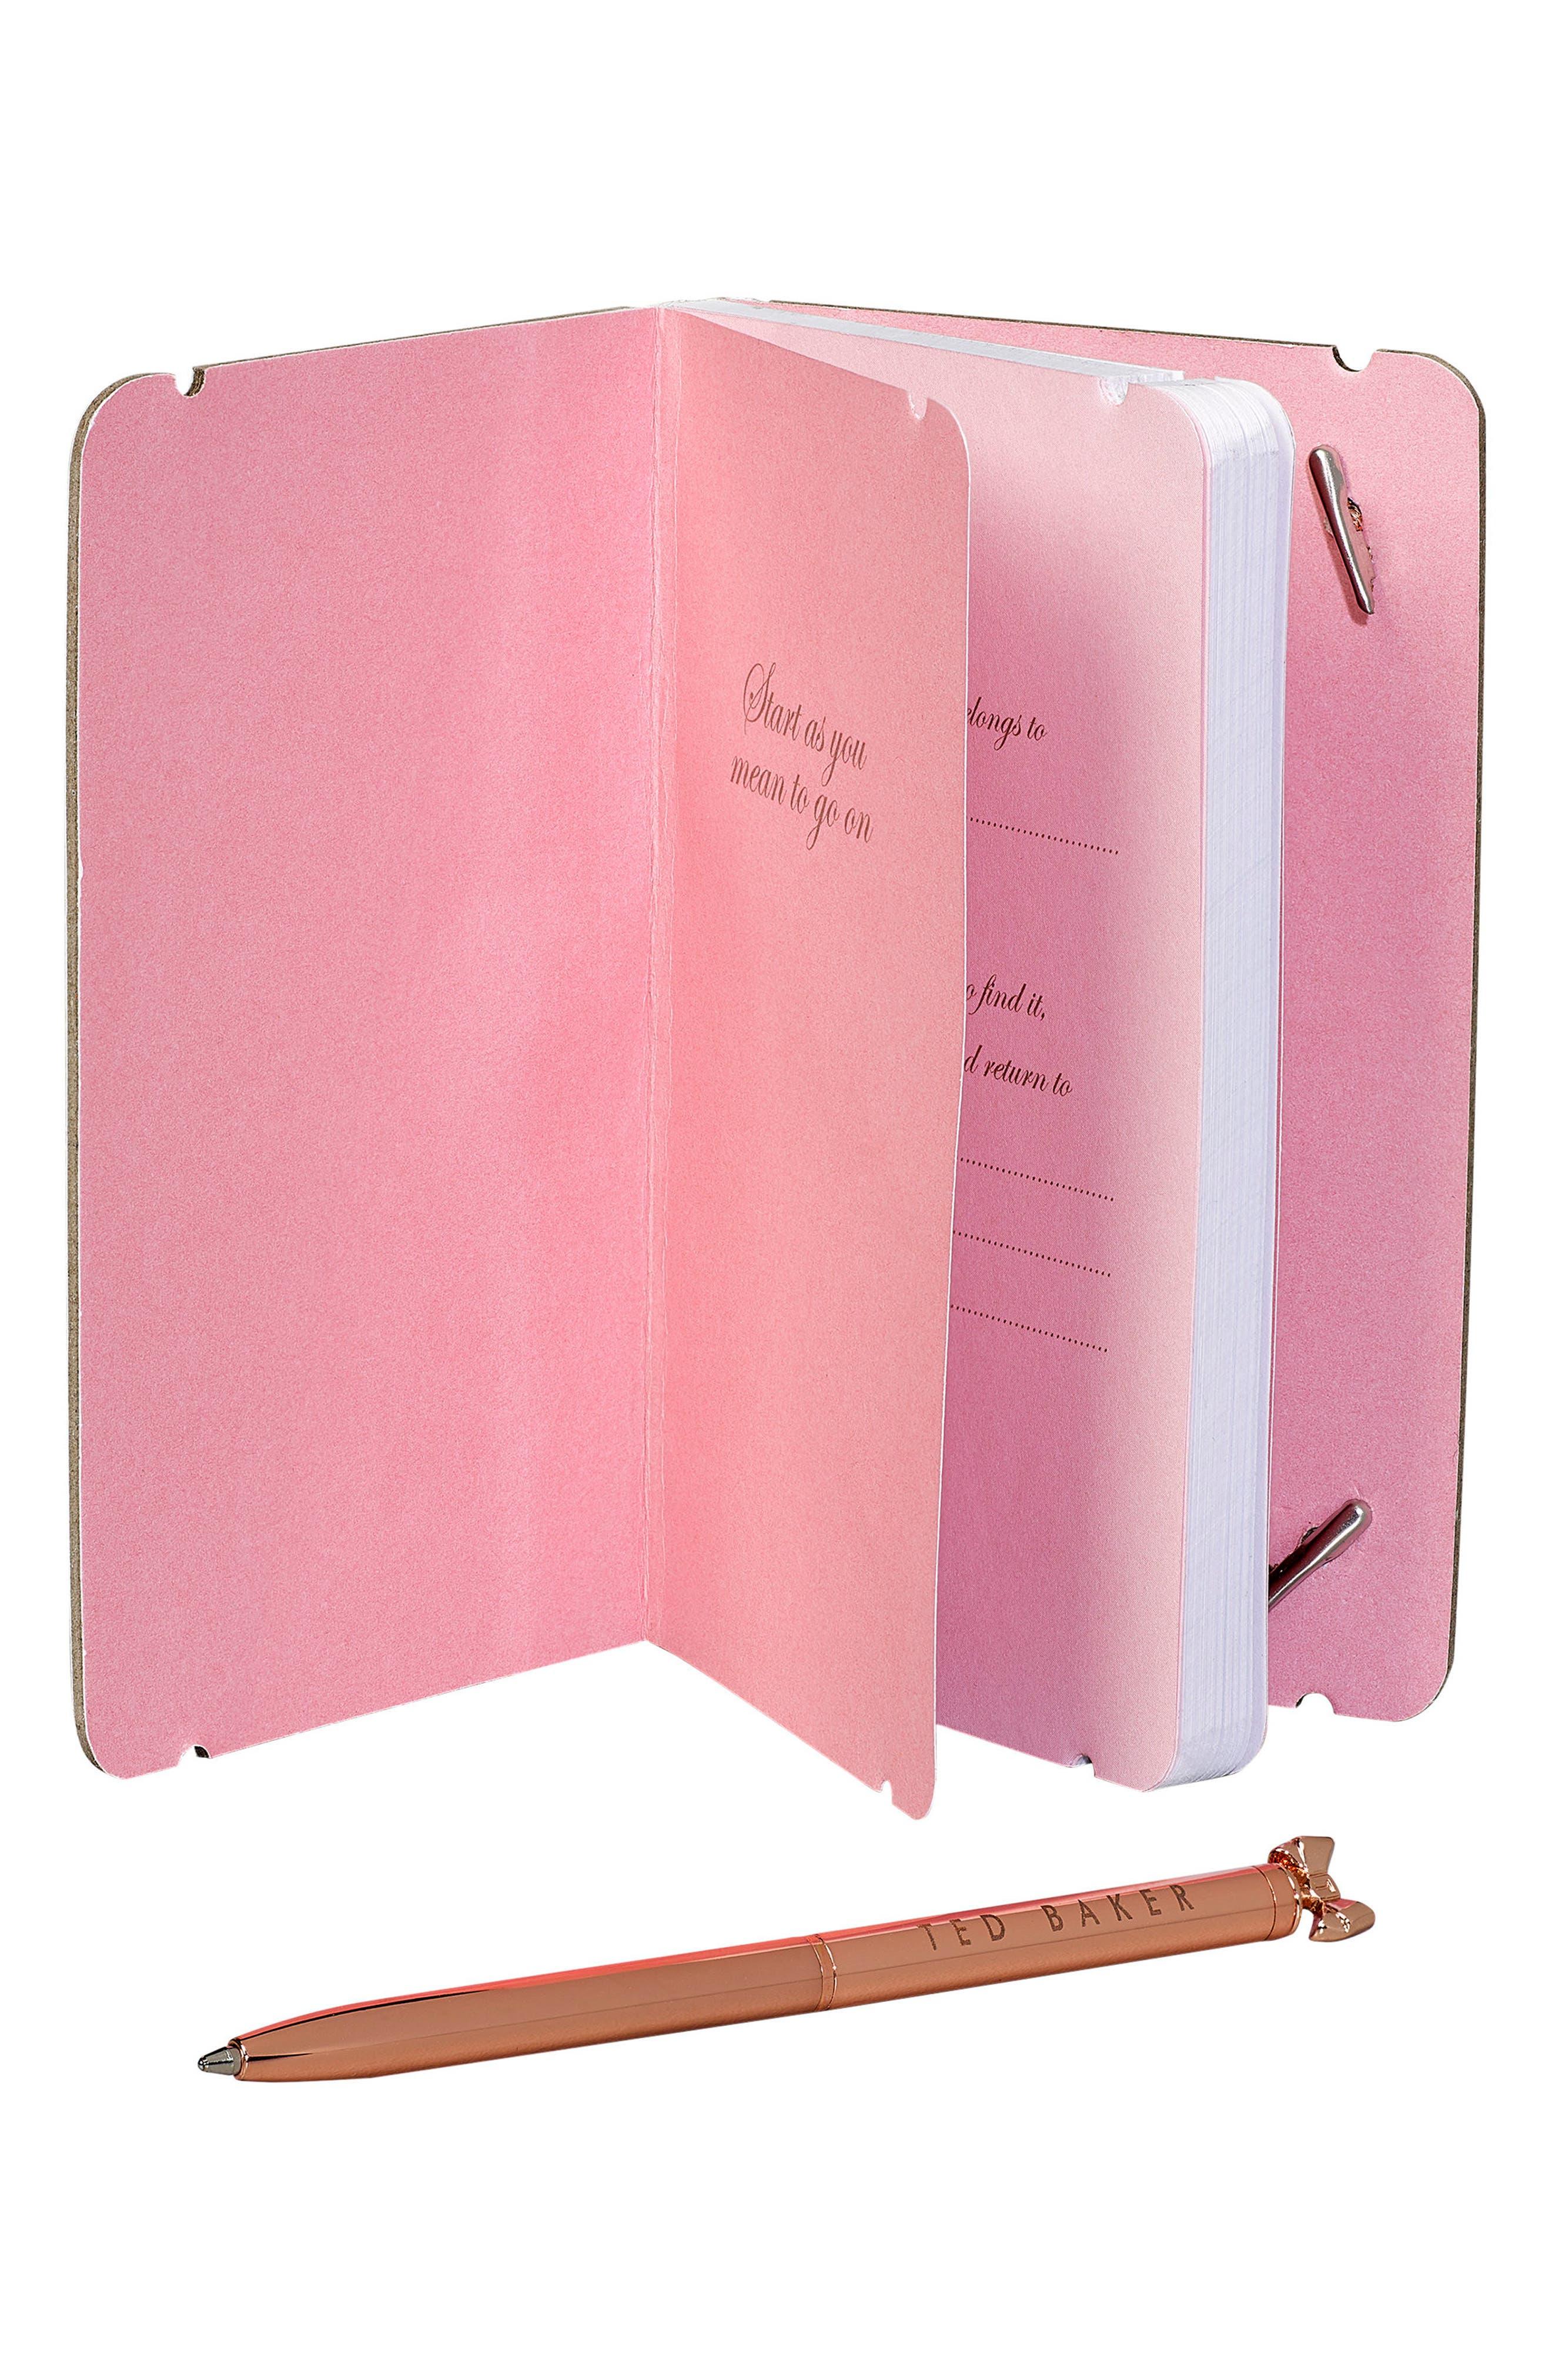 Mini Notebook & Pen Set,                             Alternate thumbnail 3, color,                             Chelsea Border